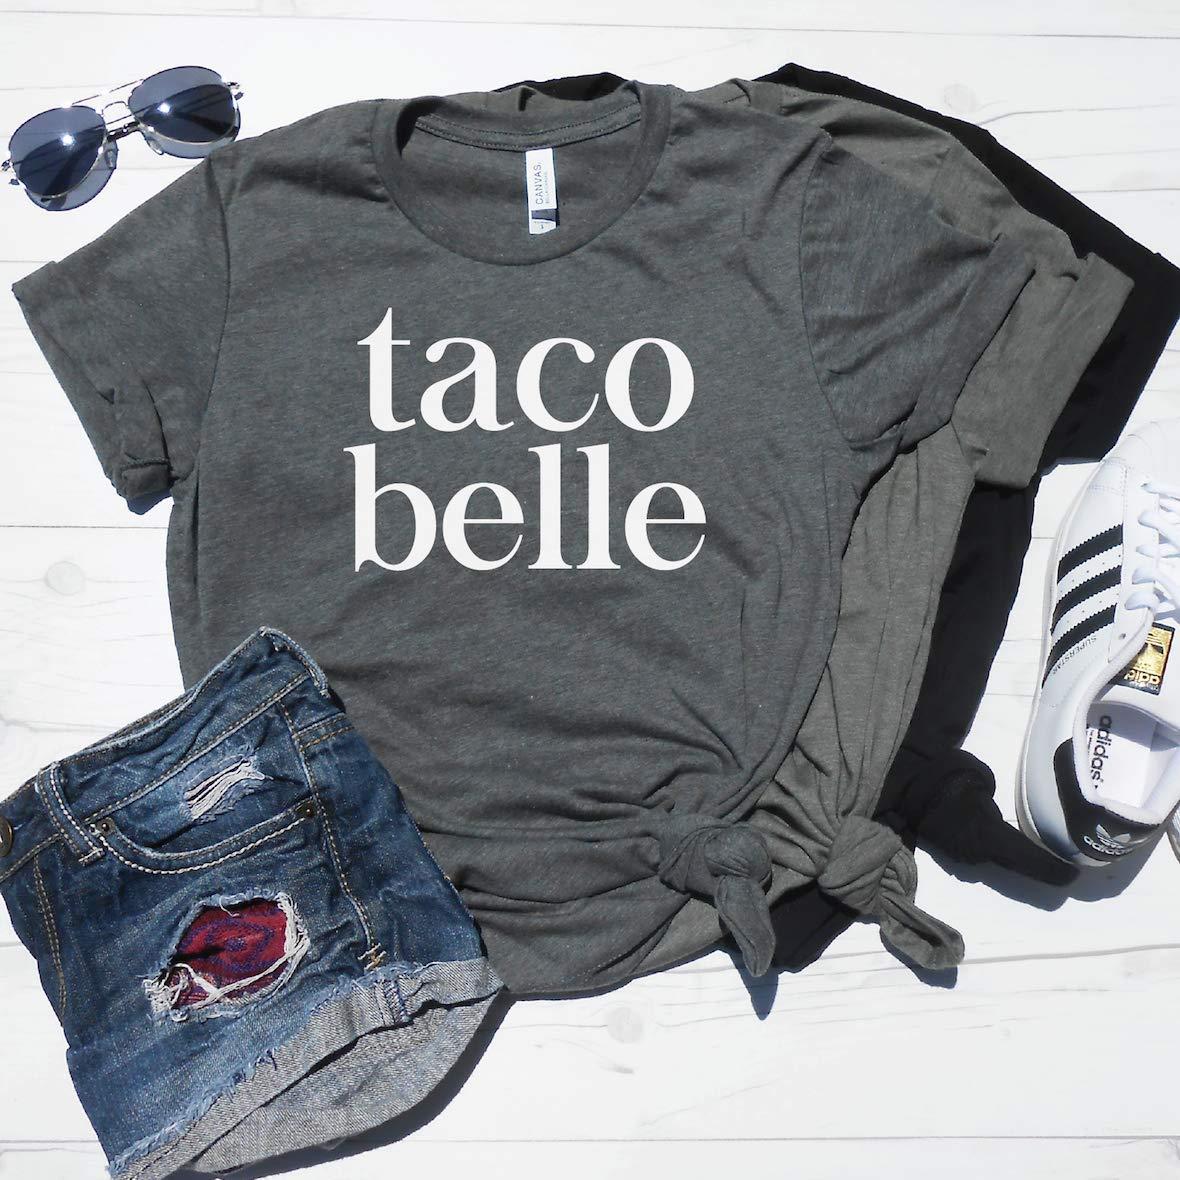 Amazon Taco Belle Shirt Cute Taco Shirt Funny Taco T Shirt